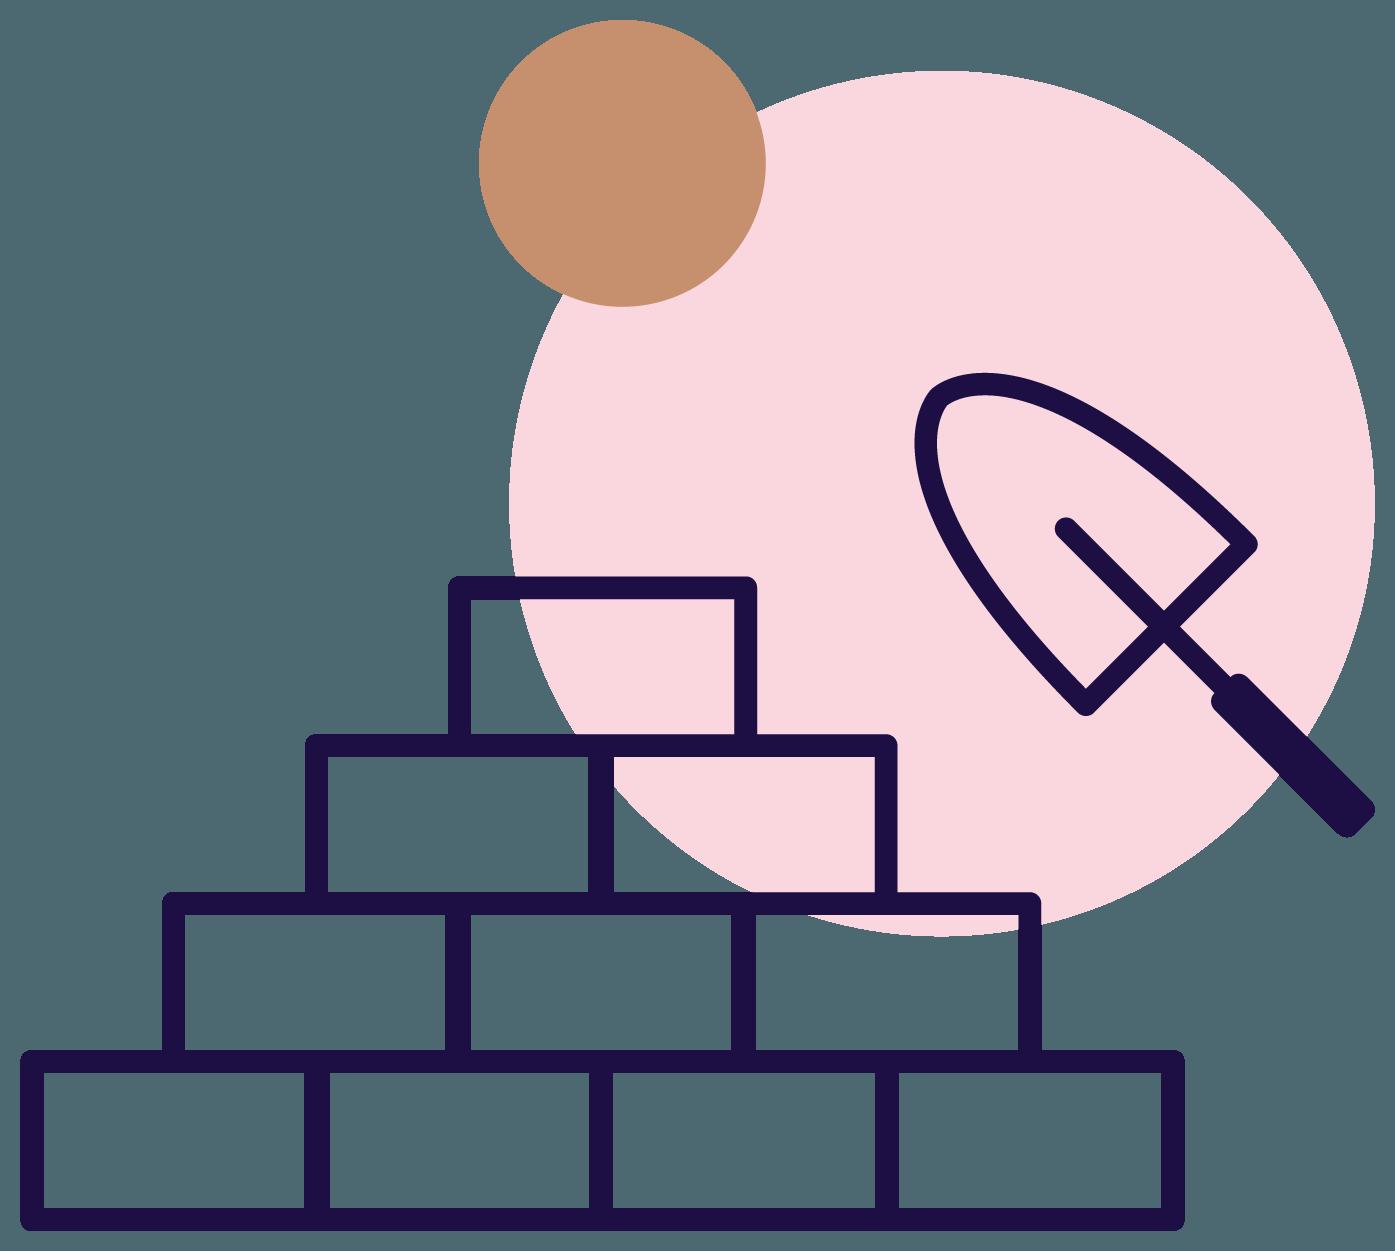 Jena Marie illustration of brick pile with trovel